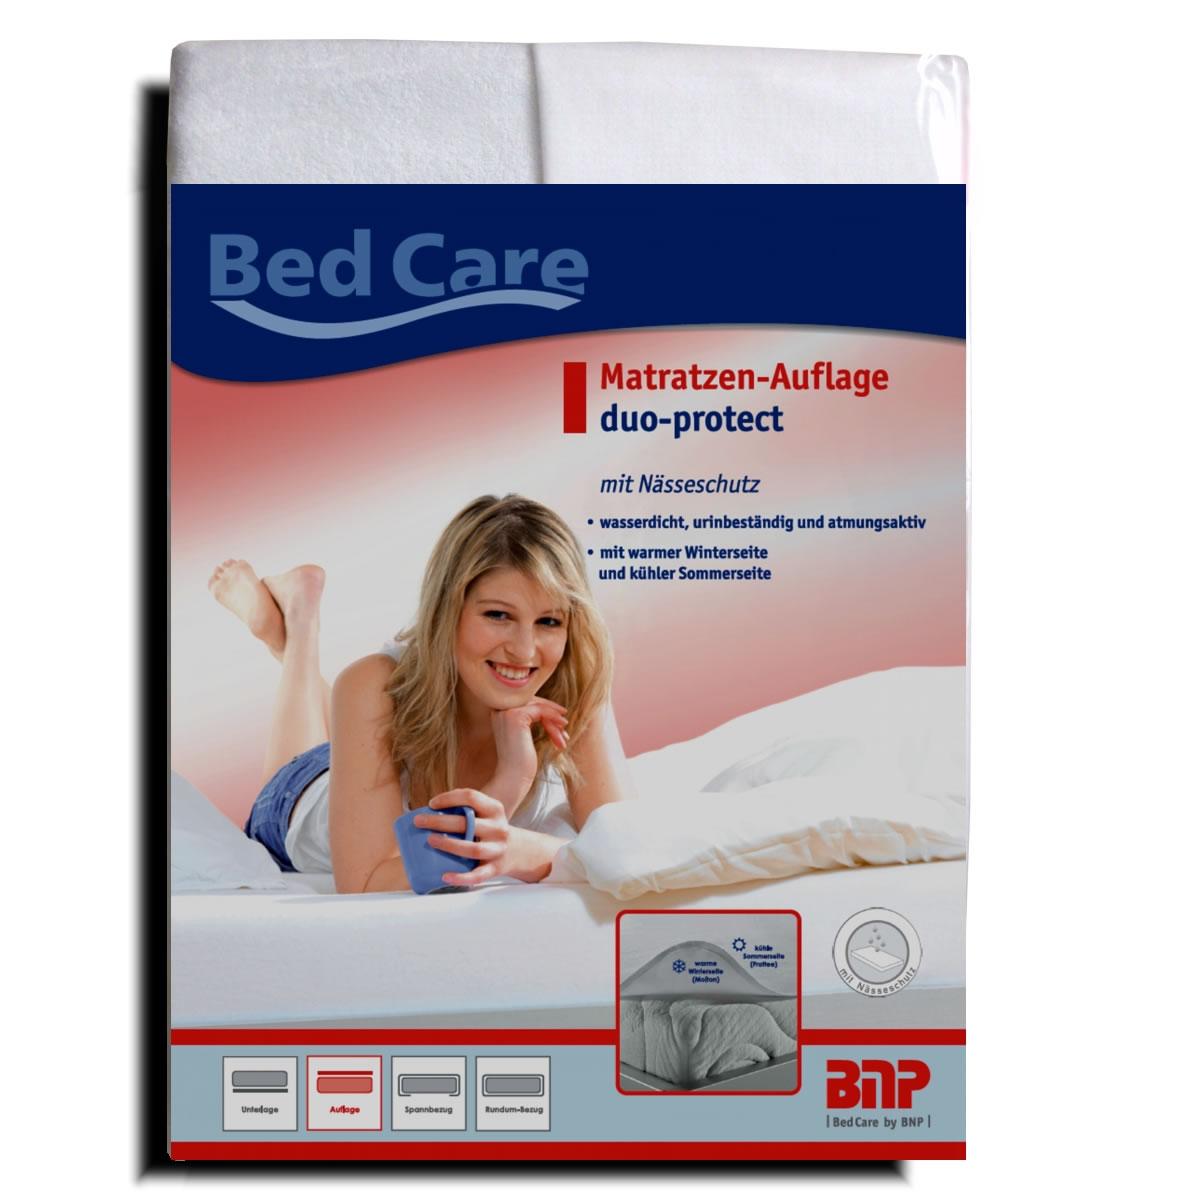 bnp bed care matratzenauflage duo protect n sseschutz inkontinenz. Black Bedroom Furniture Sets. Home Design Ideas